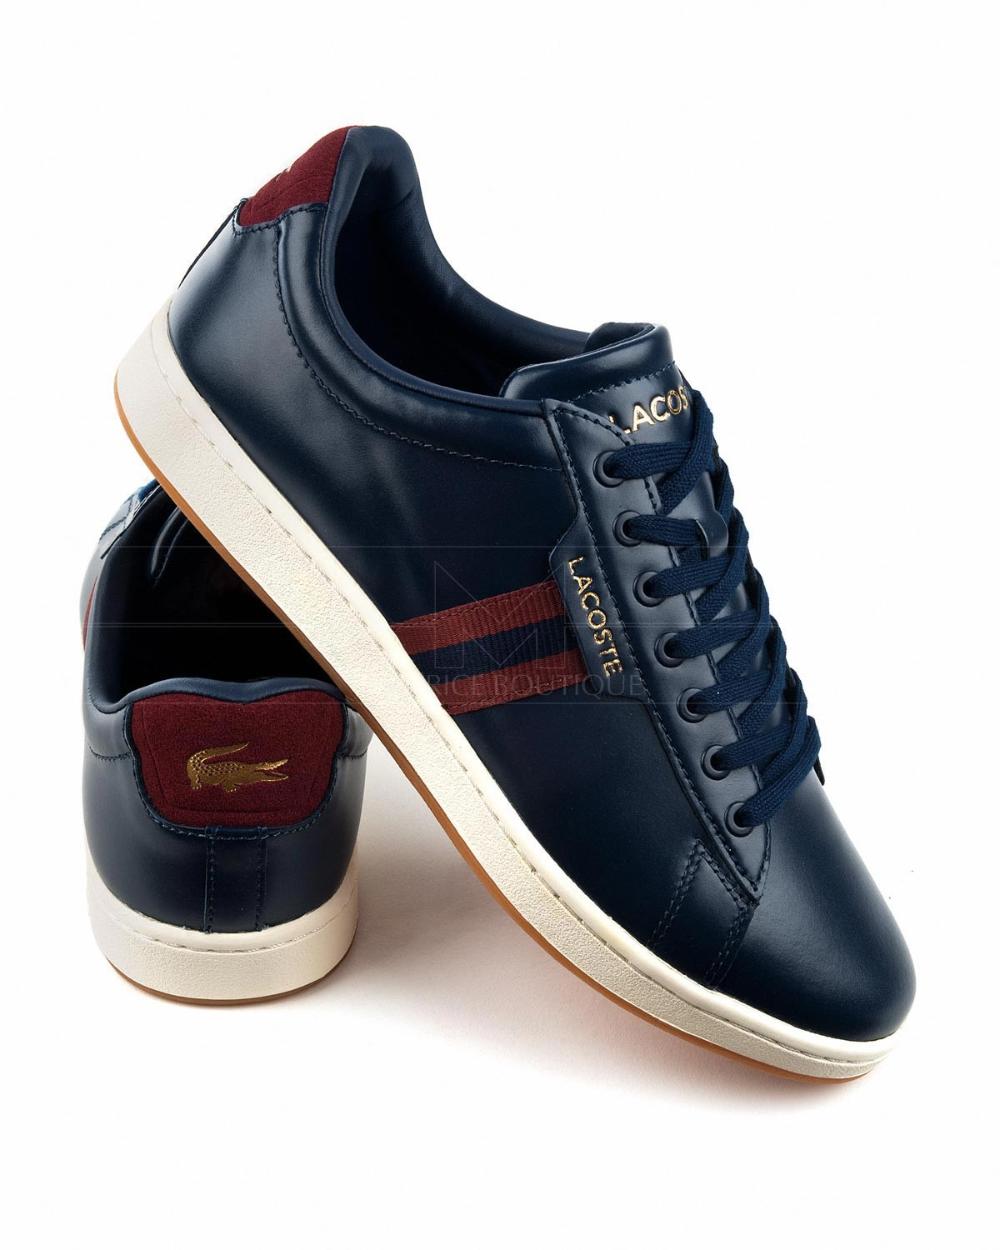 Zapatillas Lacoste Carnaby Evo 419 3 Azul Marino Envio Gratis Zapatillas Lacoste Zapatos Mocasines Hombre Zapatos Lacoste